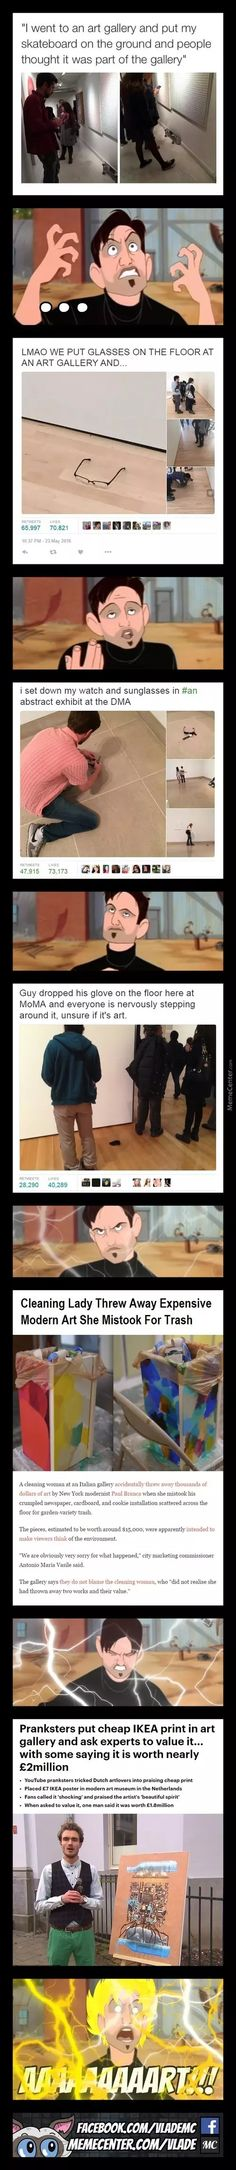 Gotta Love Modern Art, Huh?